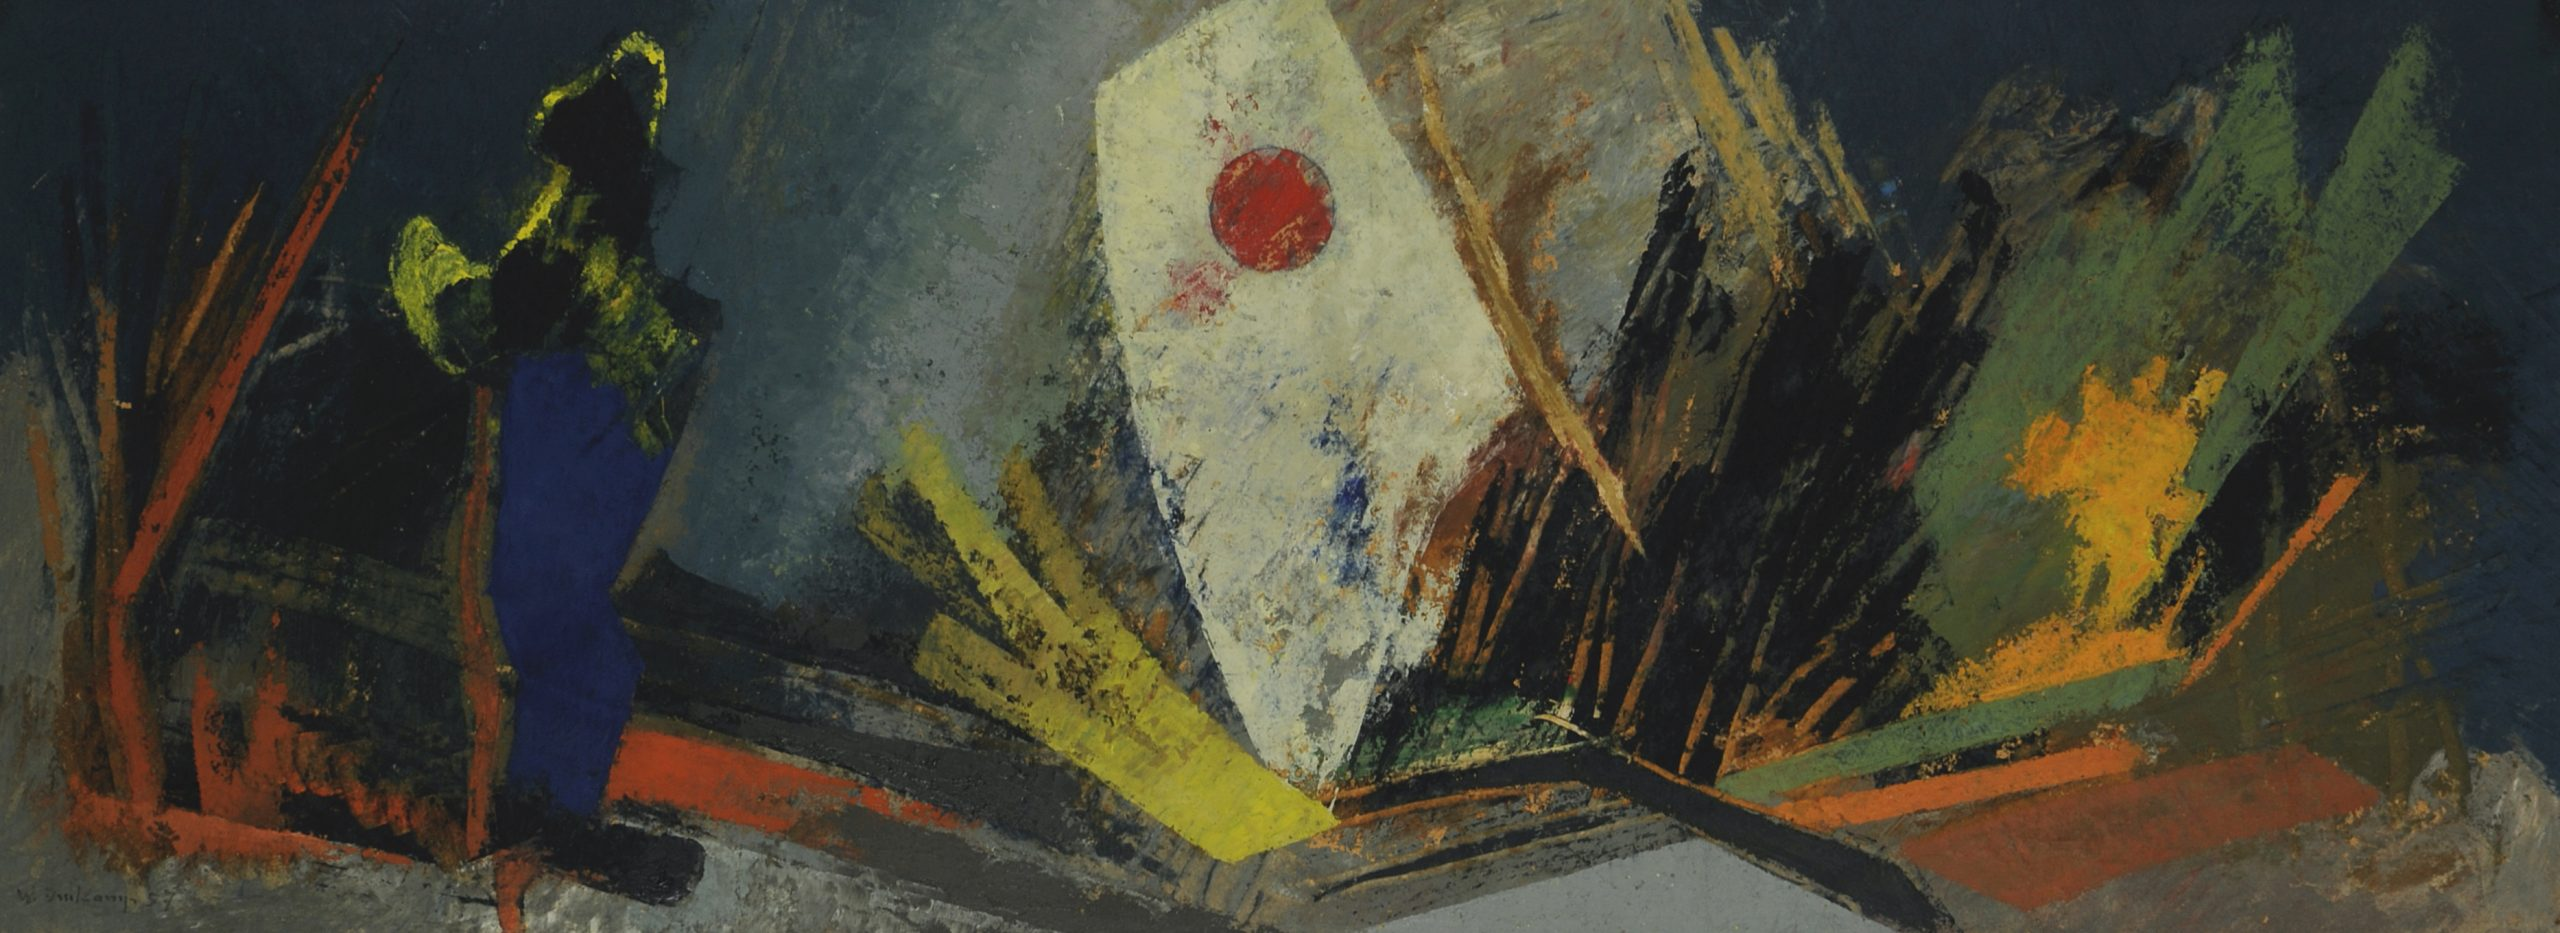 Galerie Maulberger Wilhelm Imkamp 1957